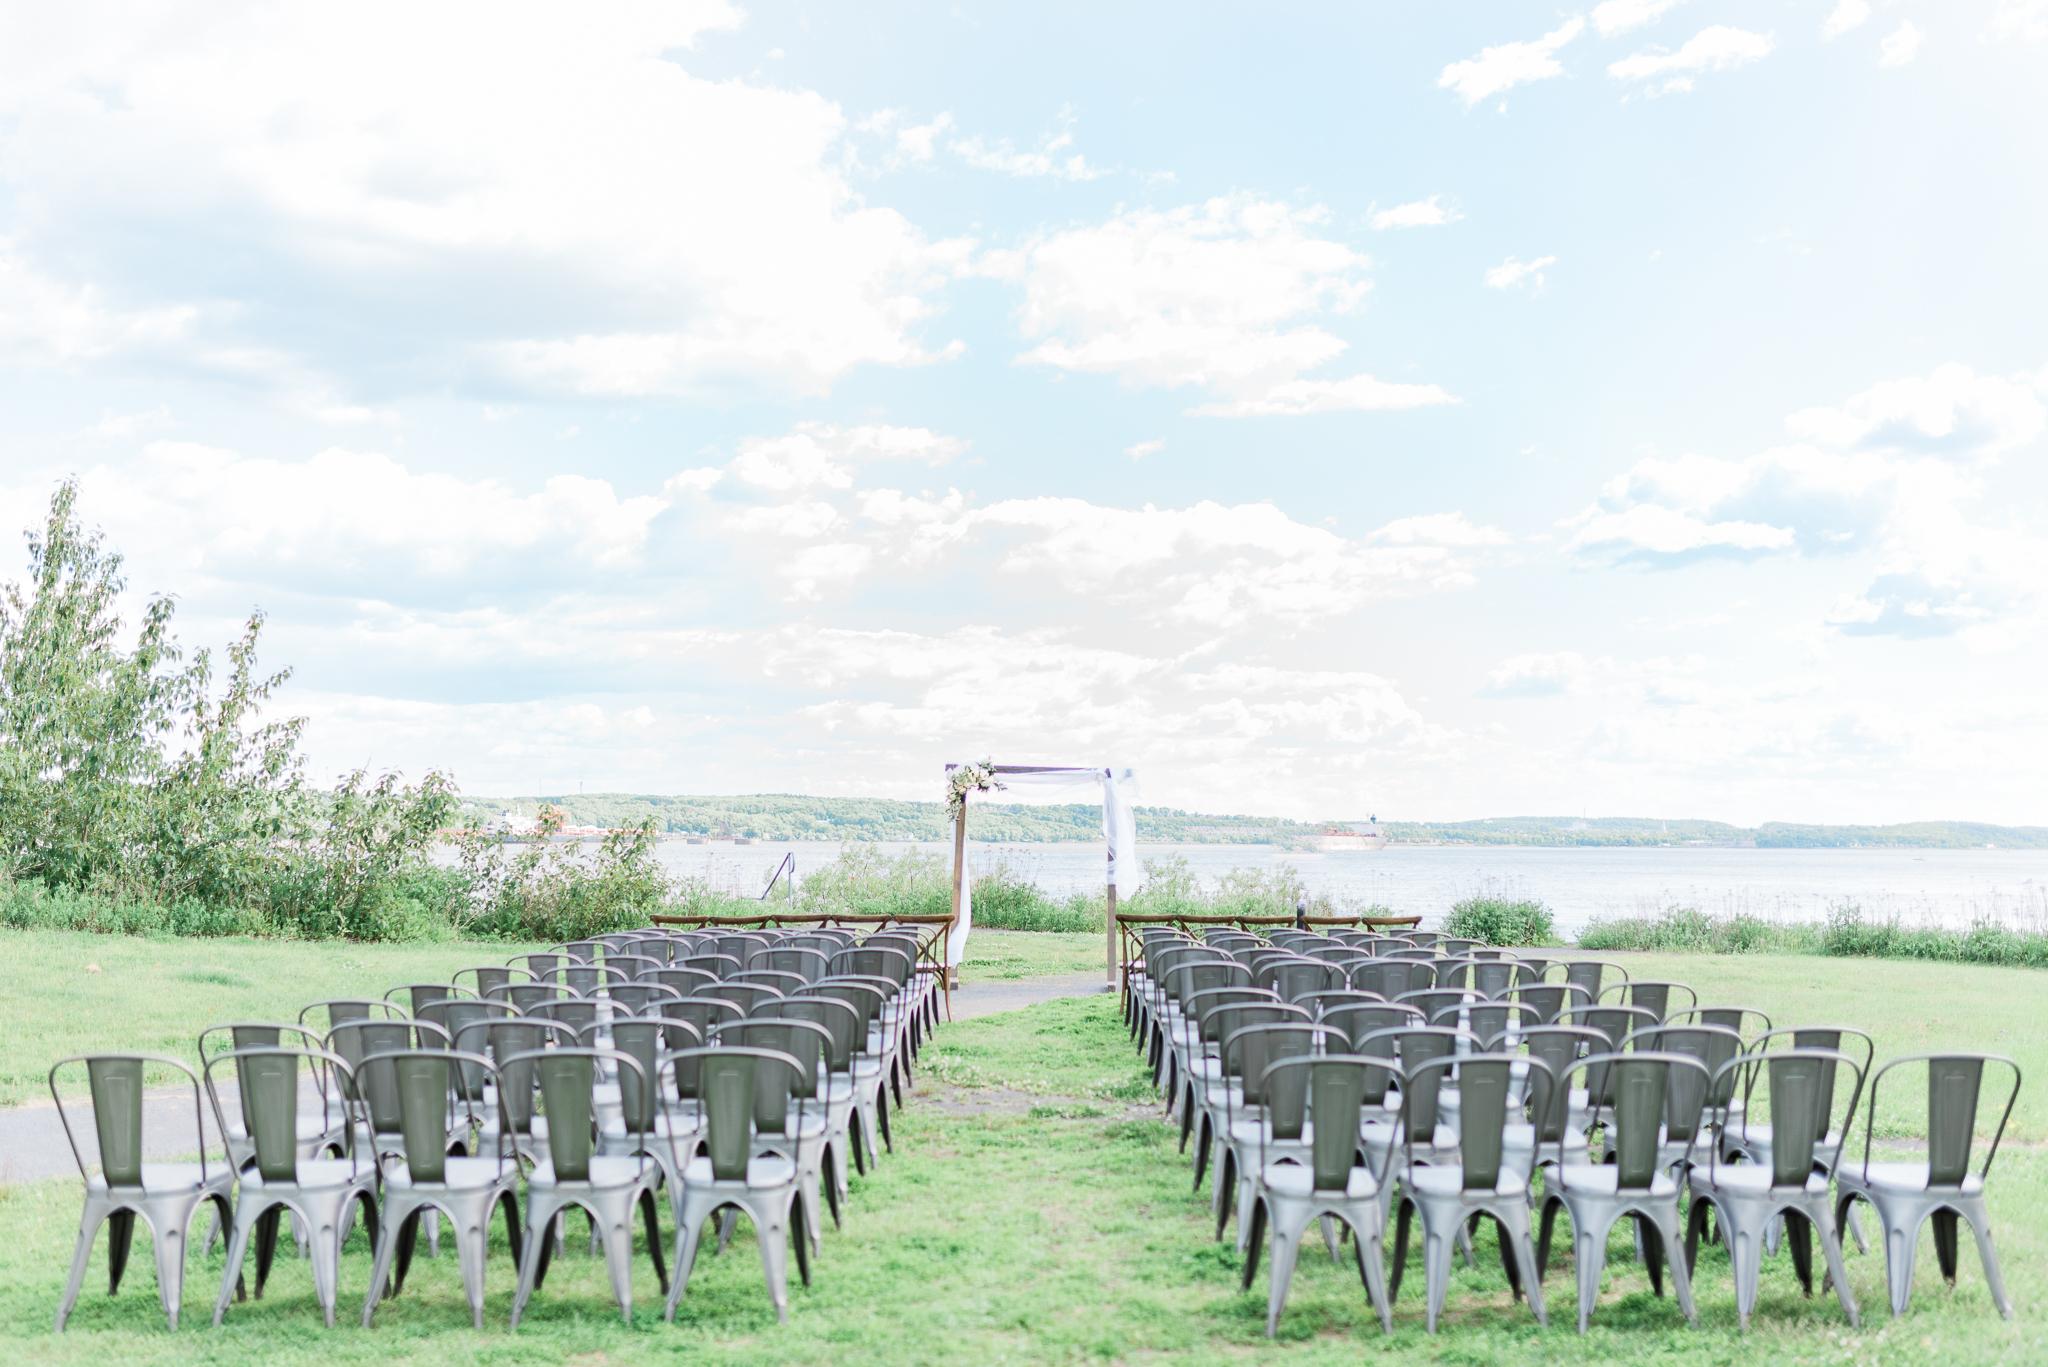 photo mariage salle du quai cap blanc quebec ceremonie toscane elisa photographe 2564 - MALYE + ANTHONY | Québec, Salle du Quai du Cap Blanc | Photographe de mariage | Elisa Photography